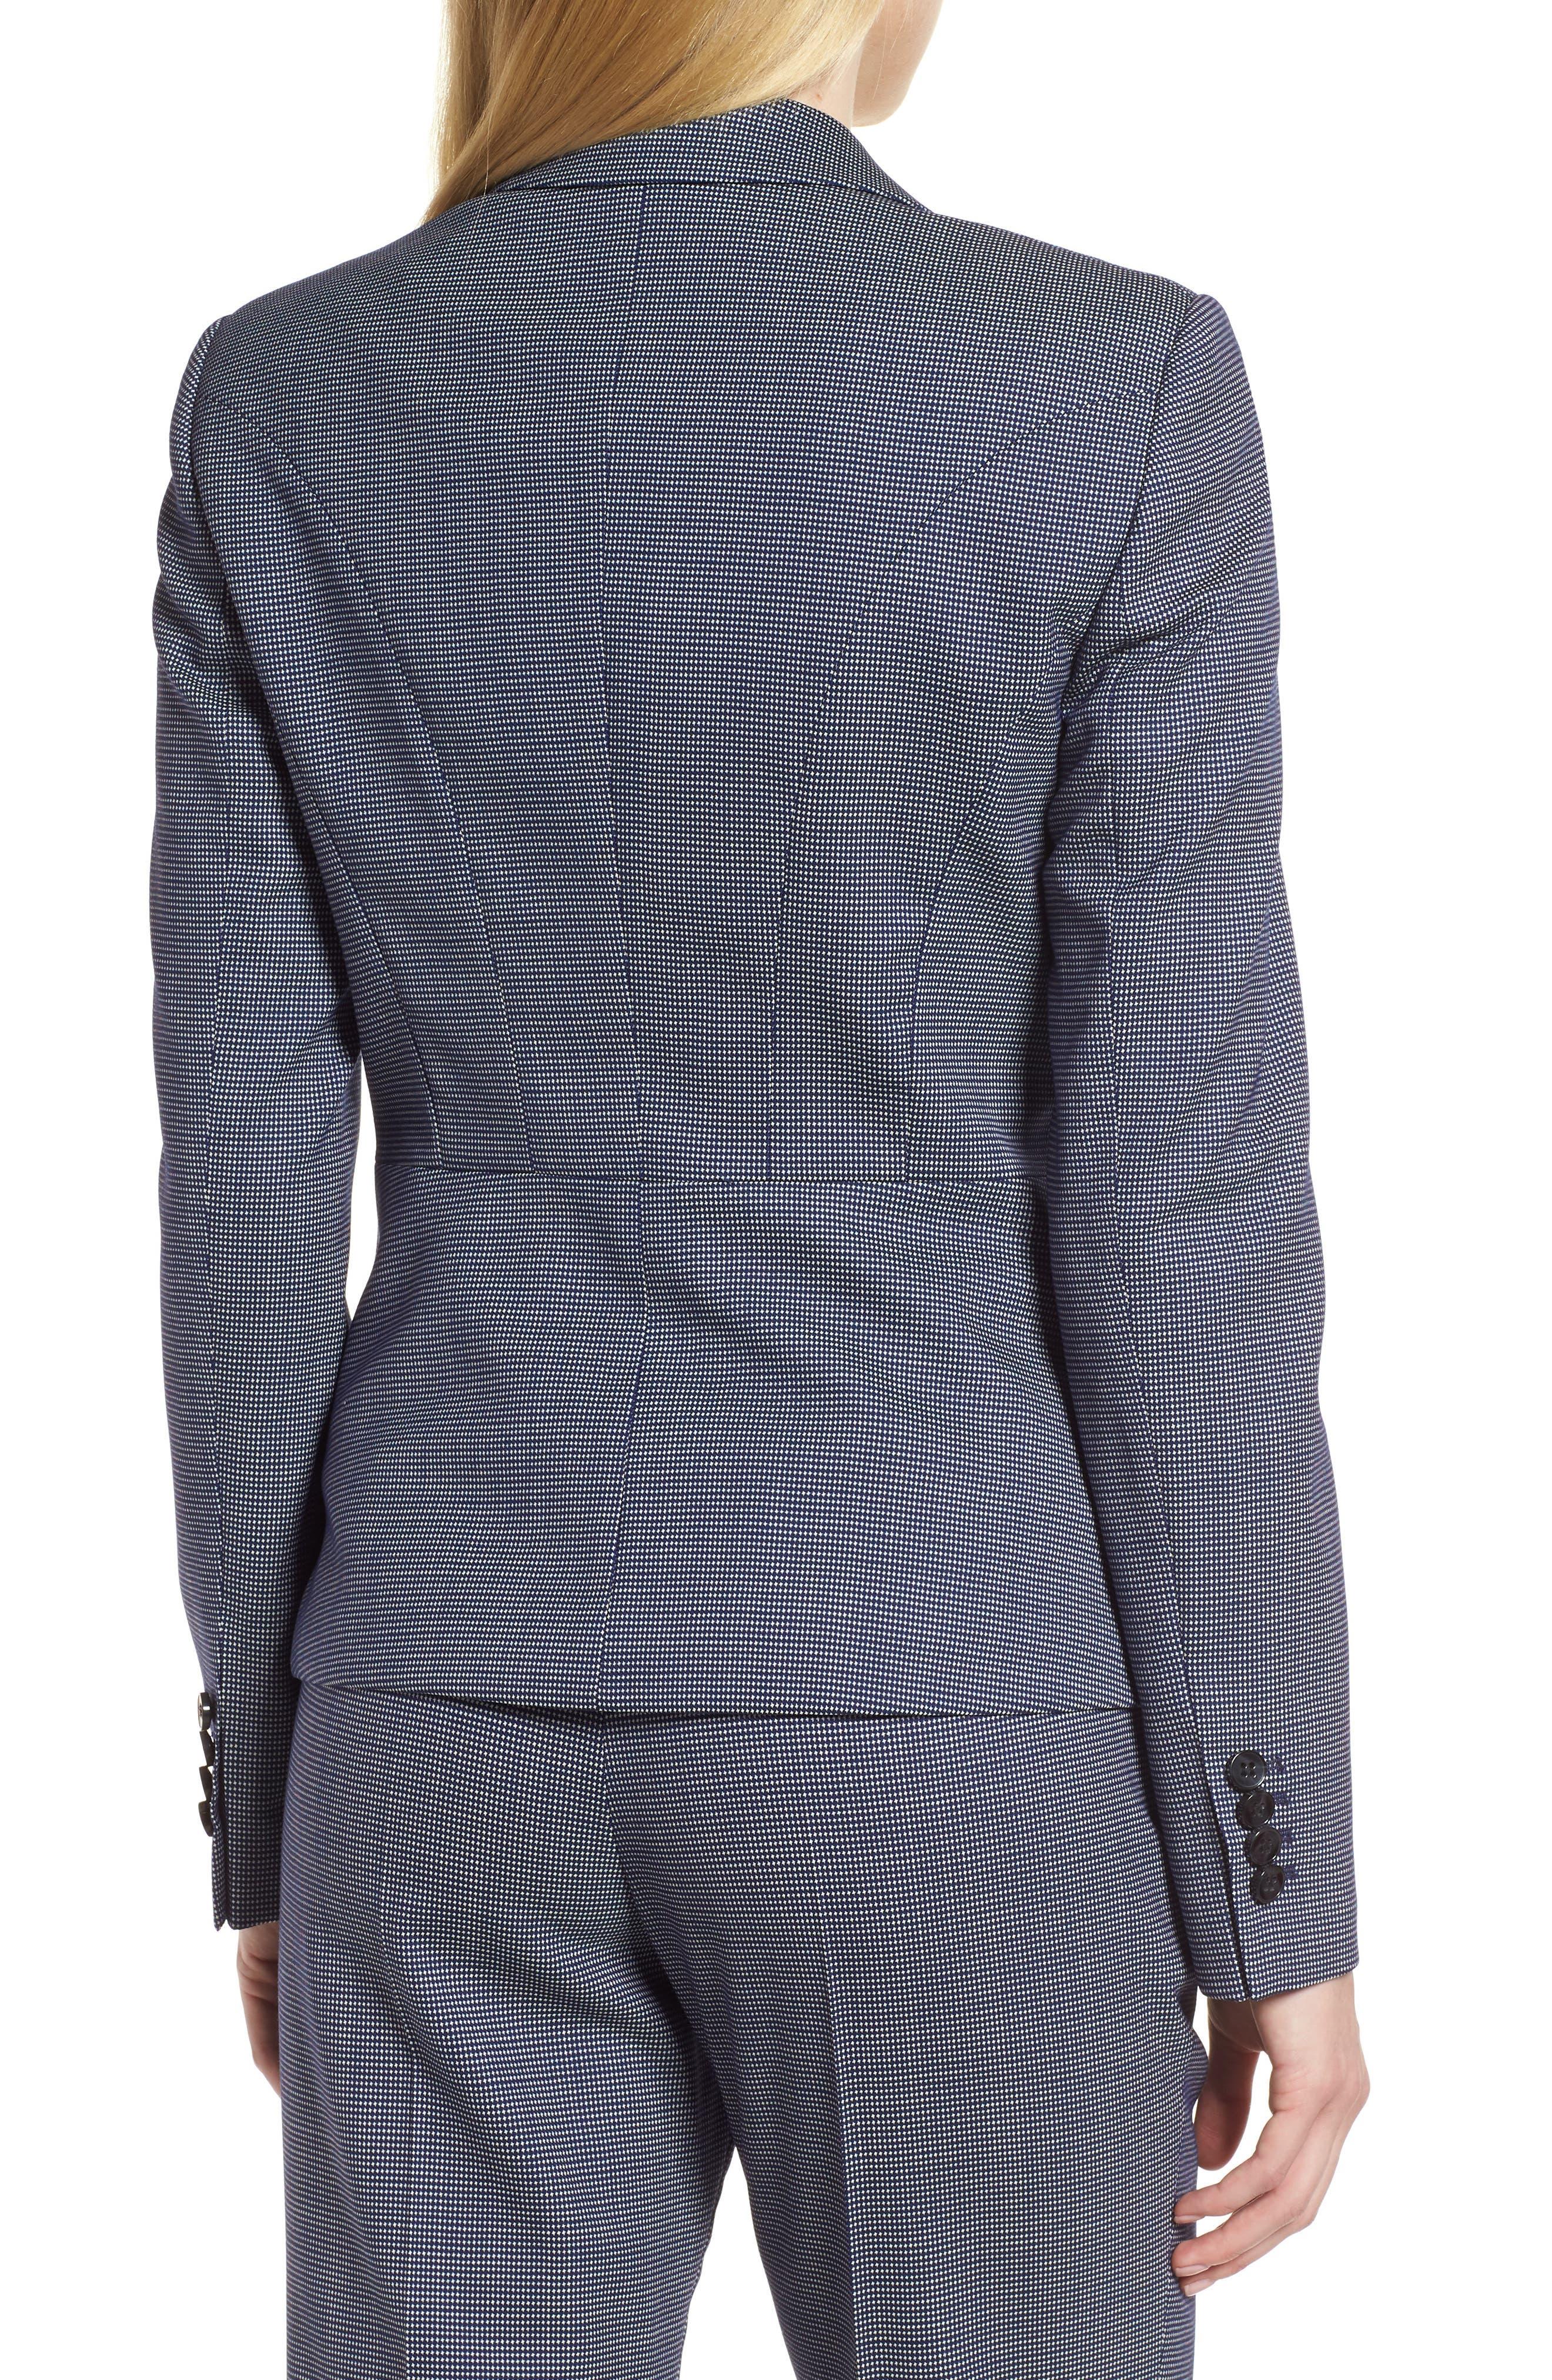 Janora Minidessin Jacket,                             Alternate thumbnail 2, color,                             462